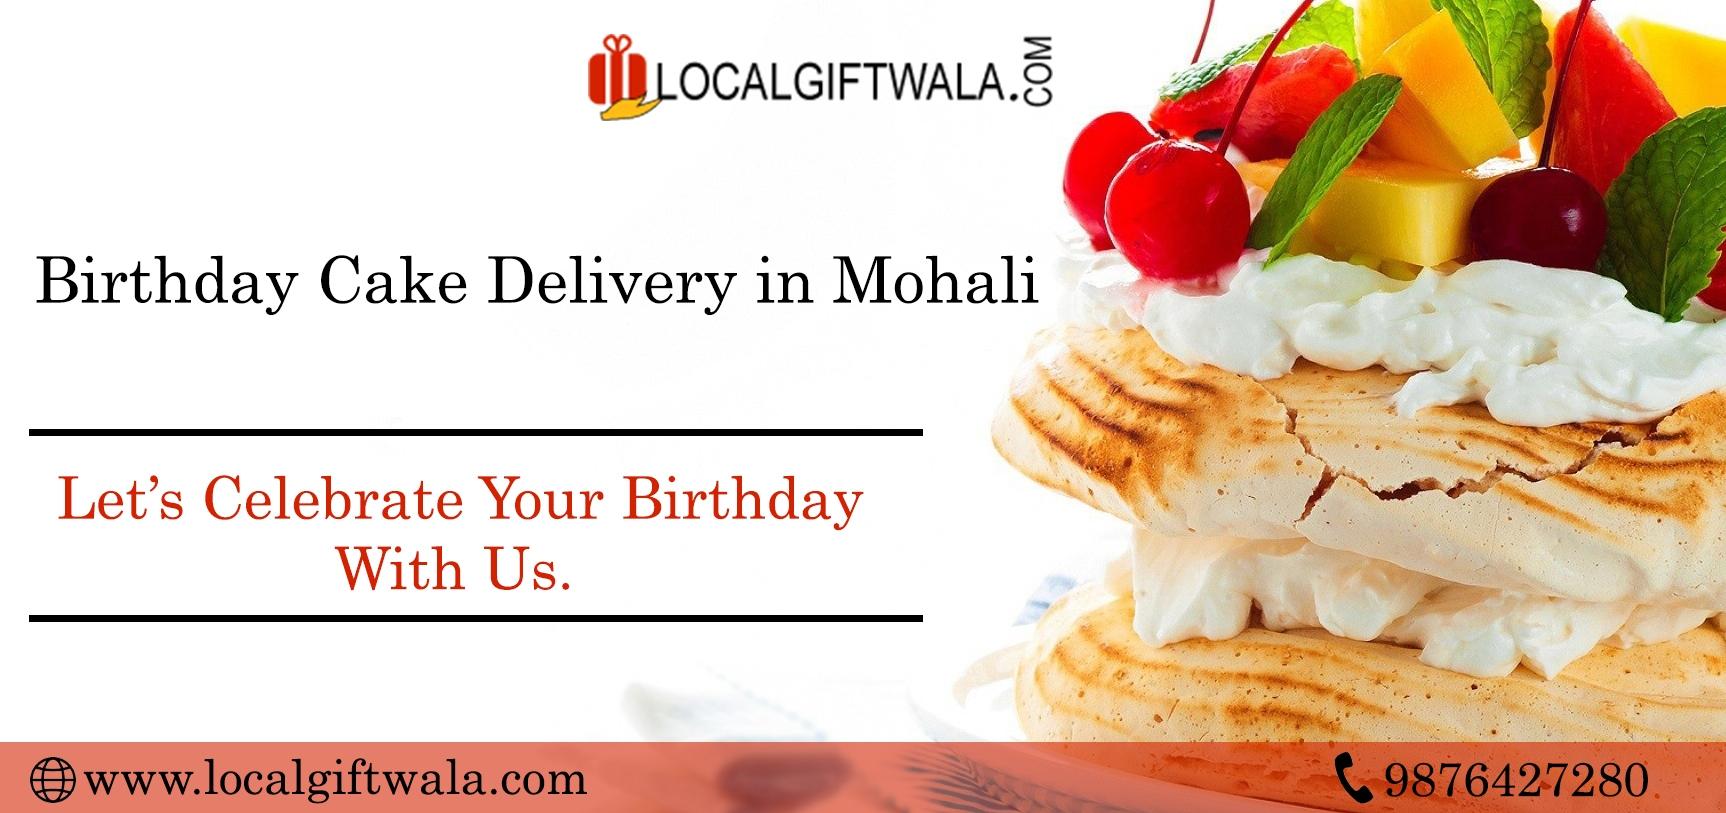 Local Giftwala (@localgiftwala) Cover Image